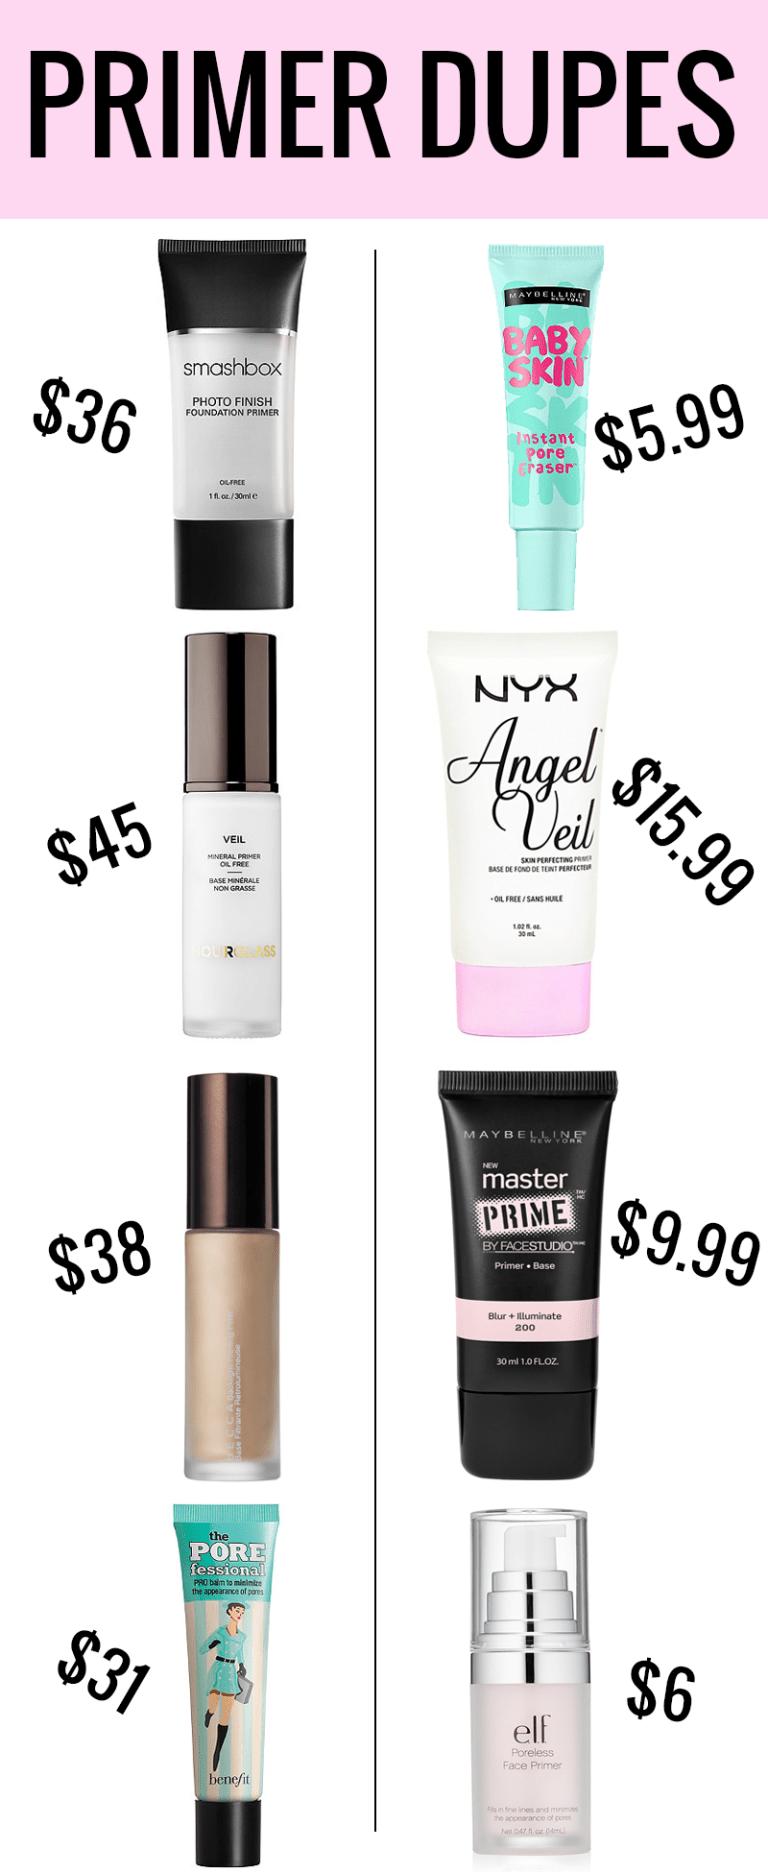 Makeup Primer Dupes Makeup Primer Dupes Makeup Primer Drugstore Makeup Dupes